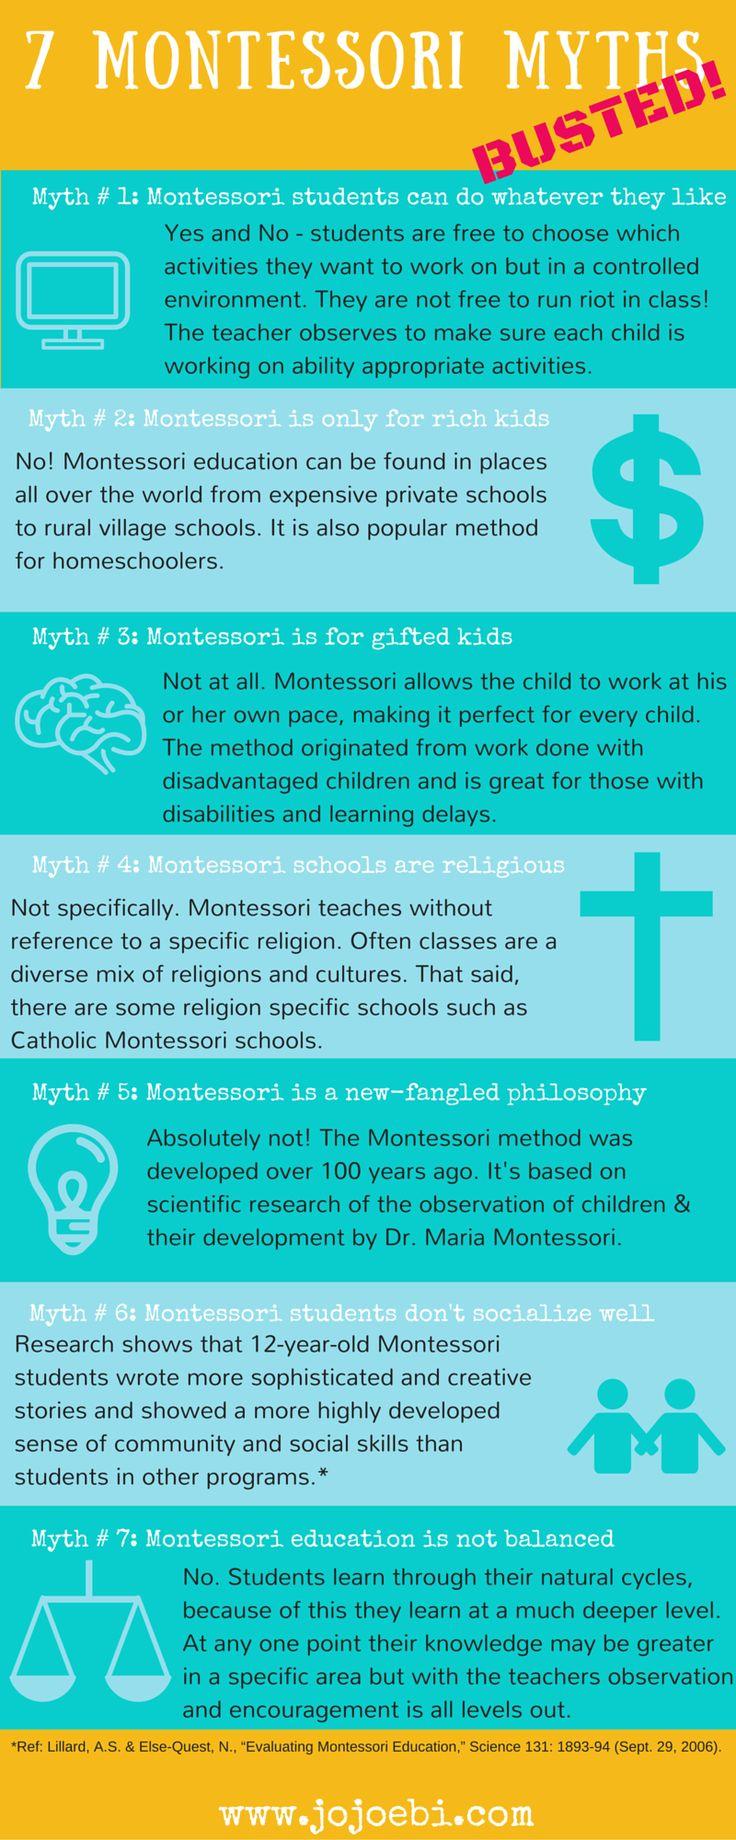 montessori infographic - 7 montessori myths busted